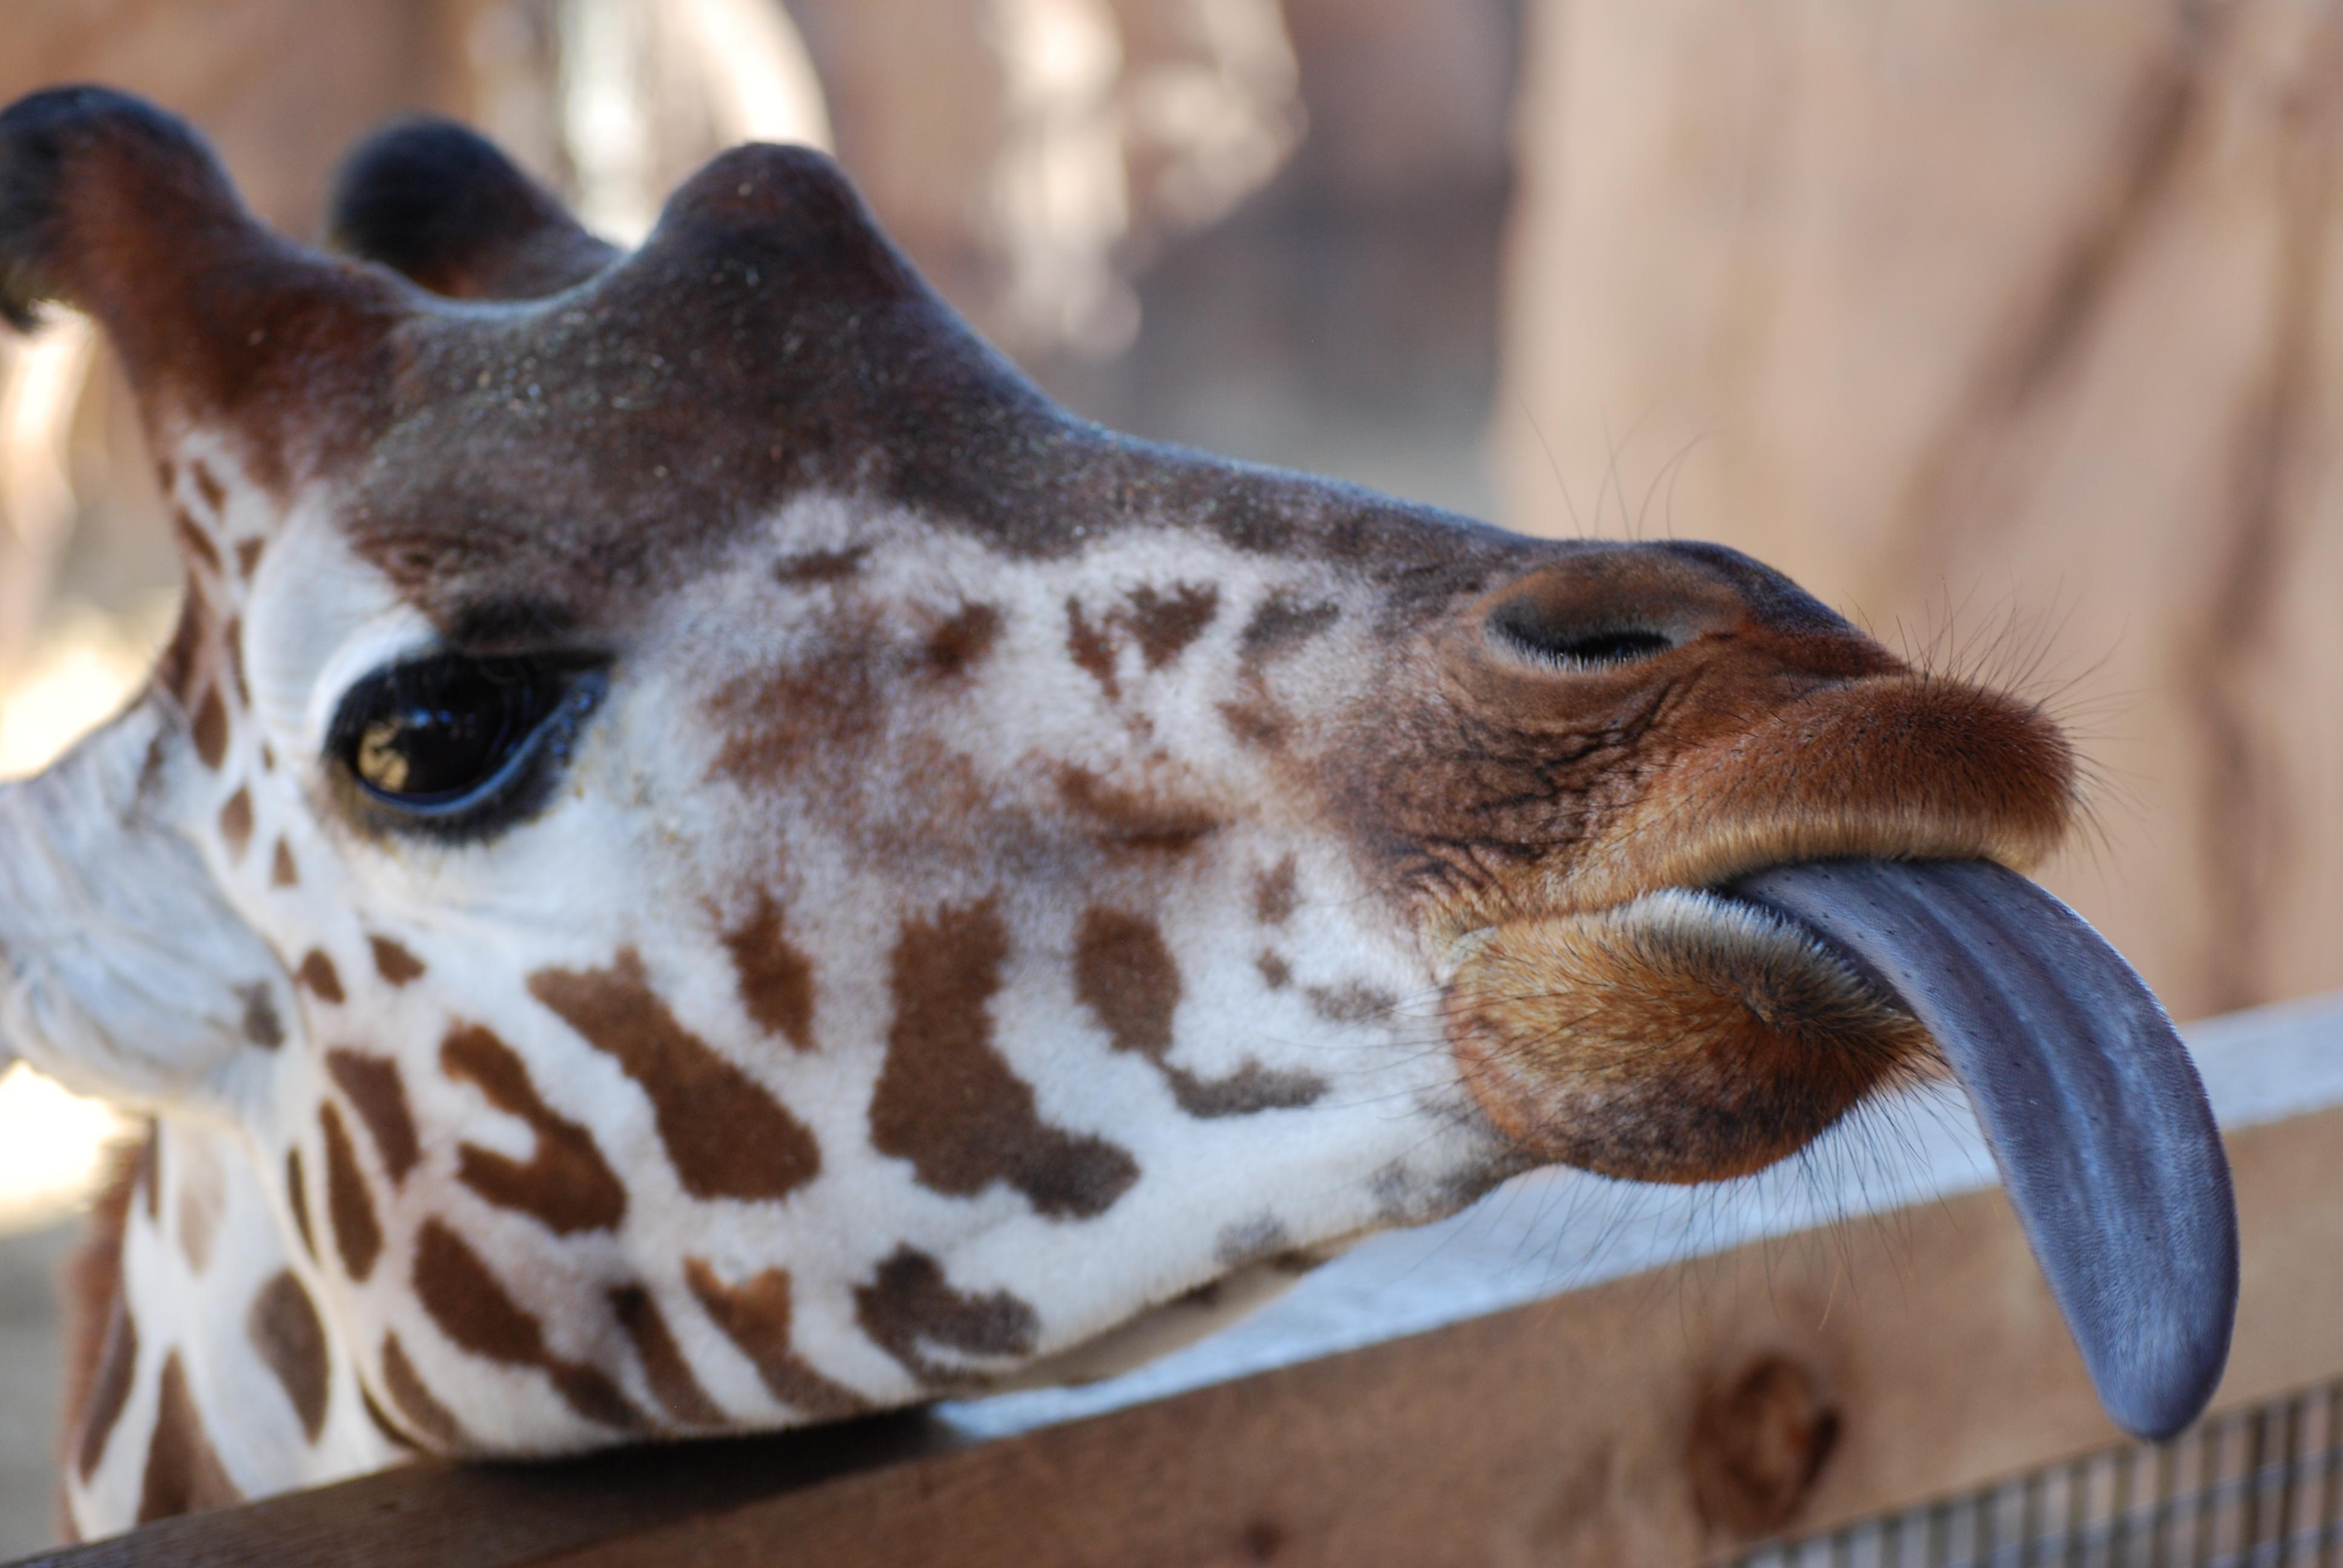 Giraffe tongue - photo#26